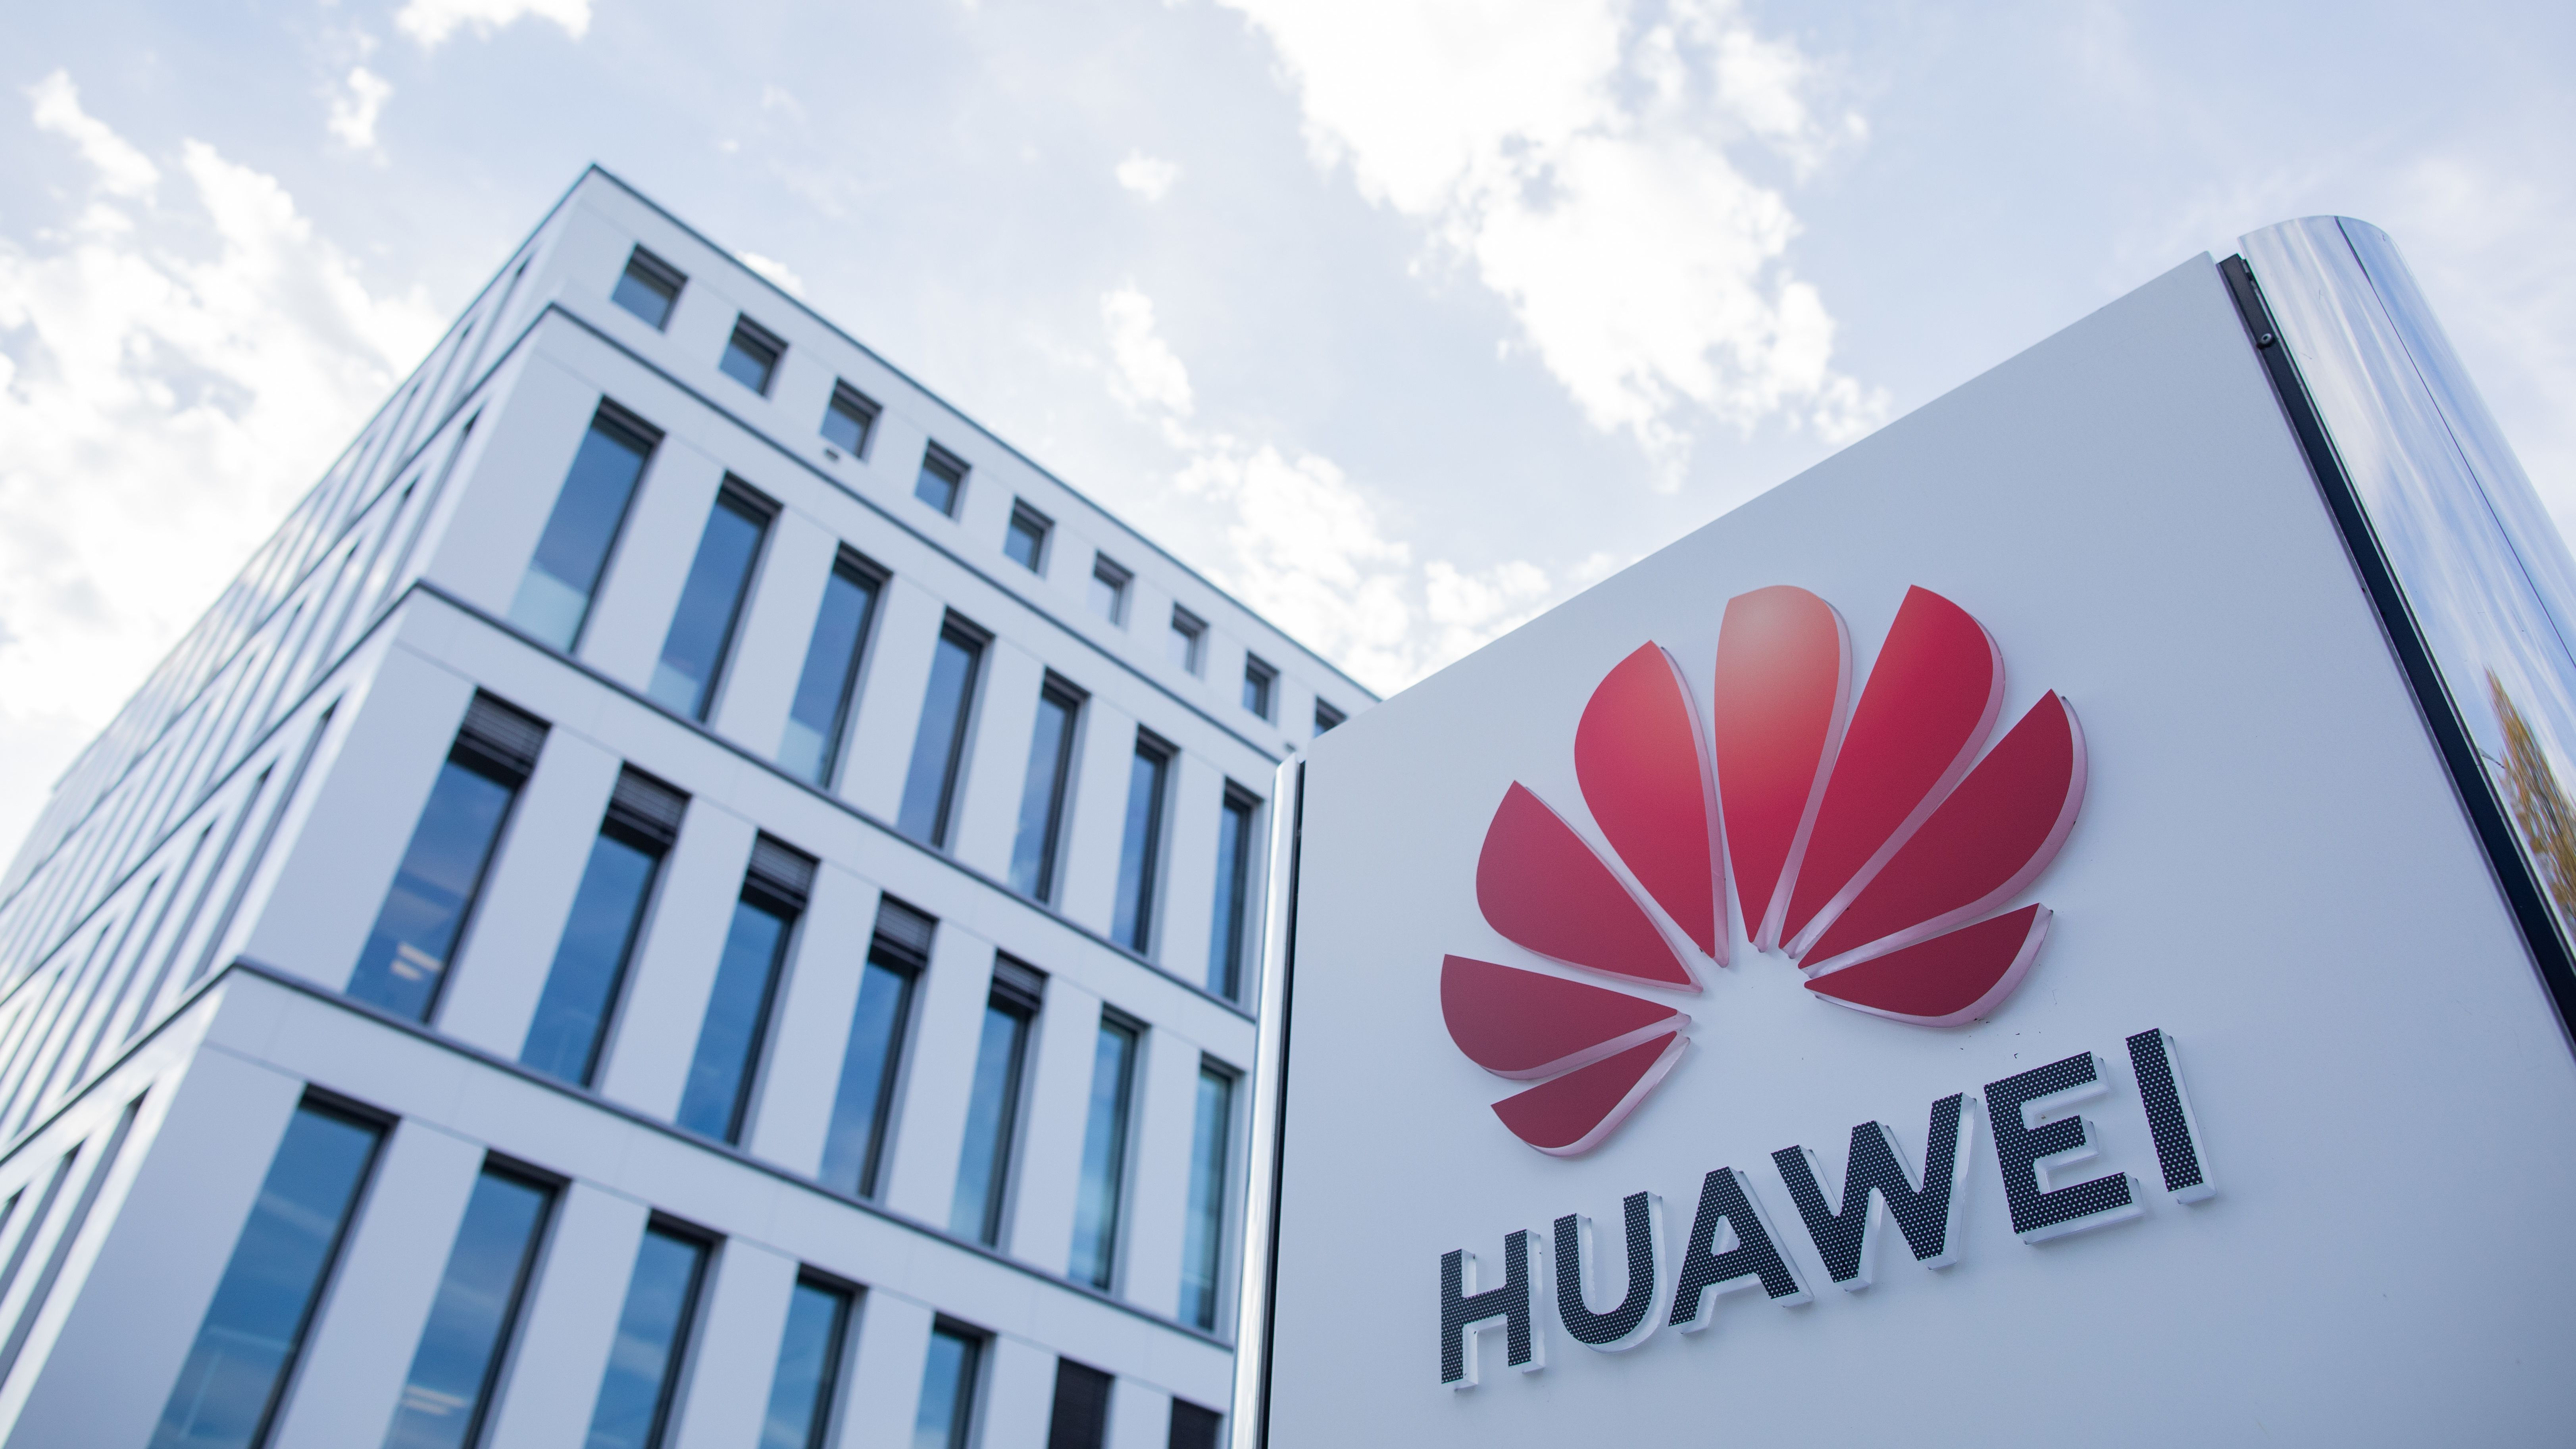 Deutsche Huawei-Zentrale in Düsseldorf